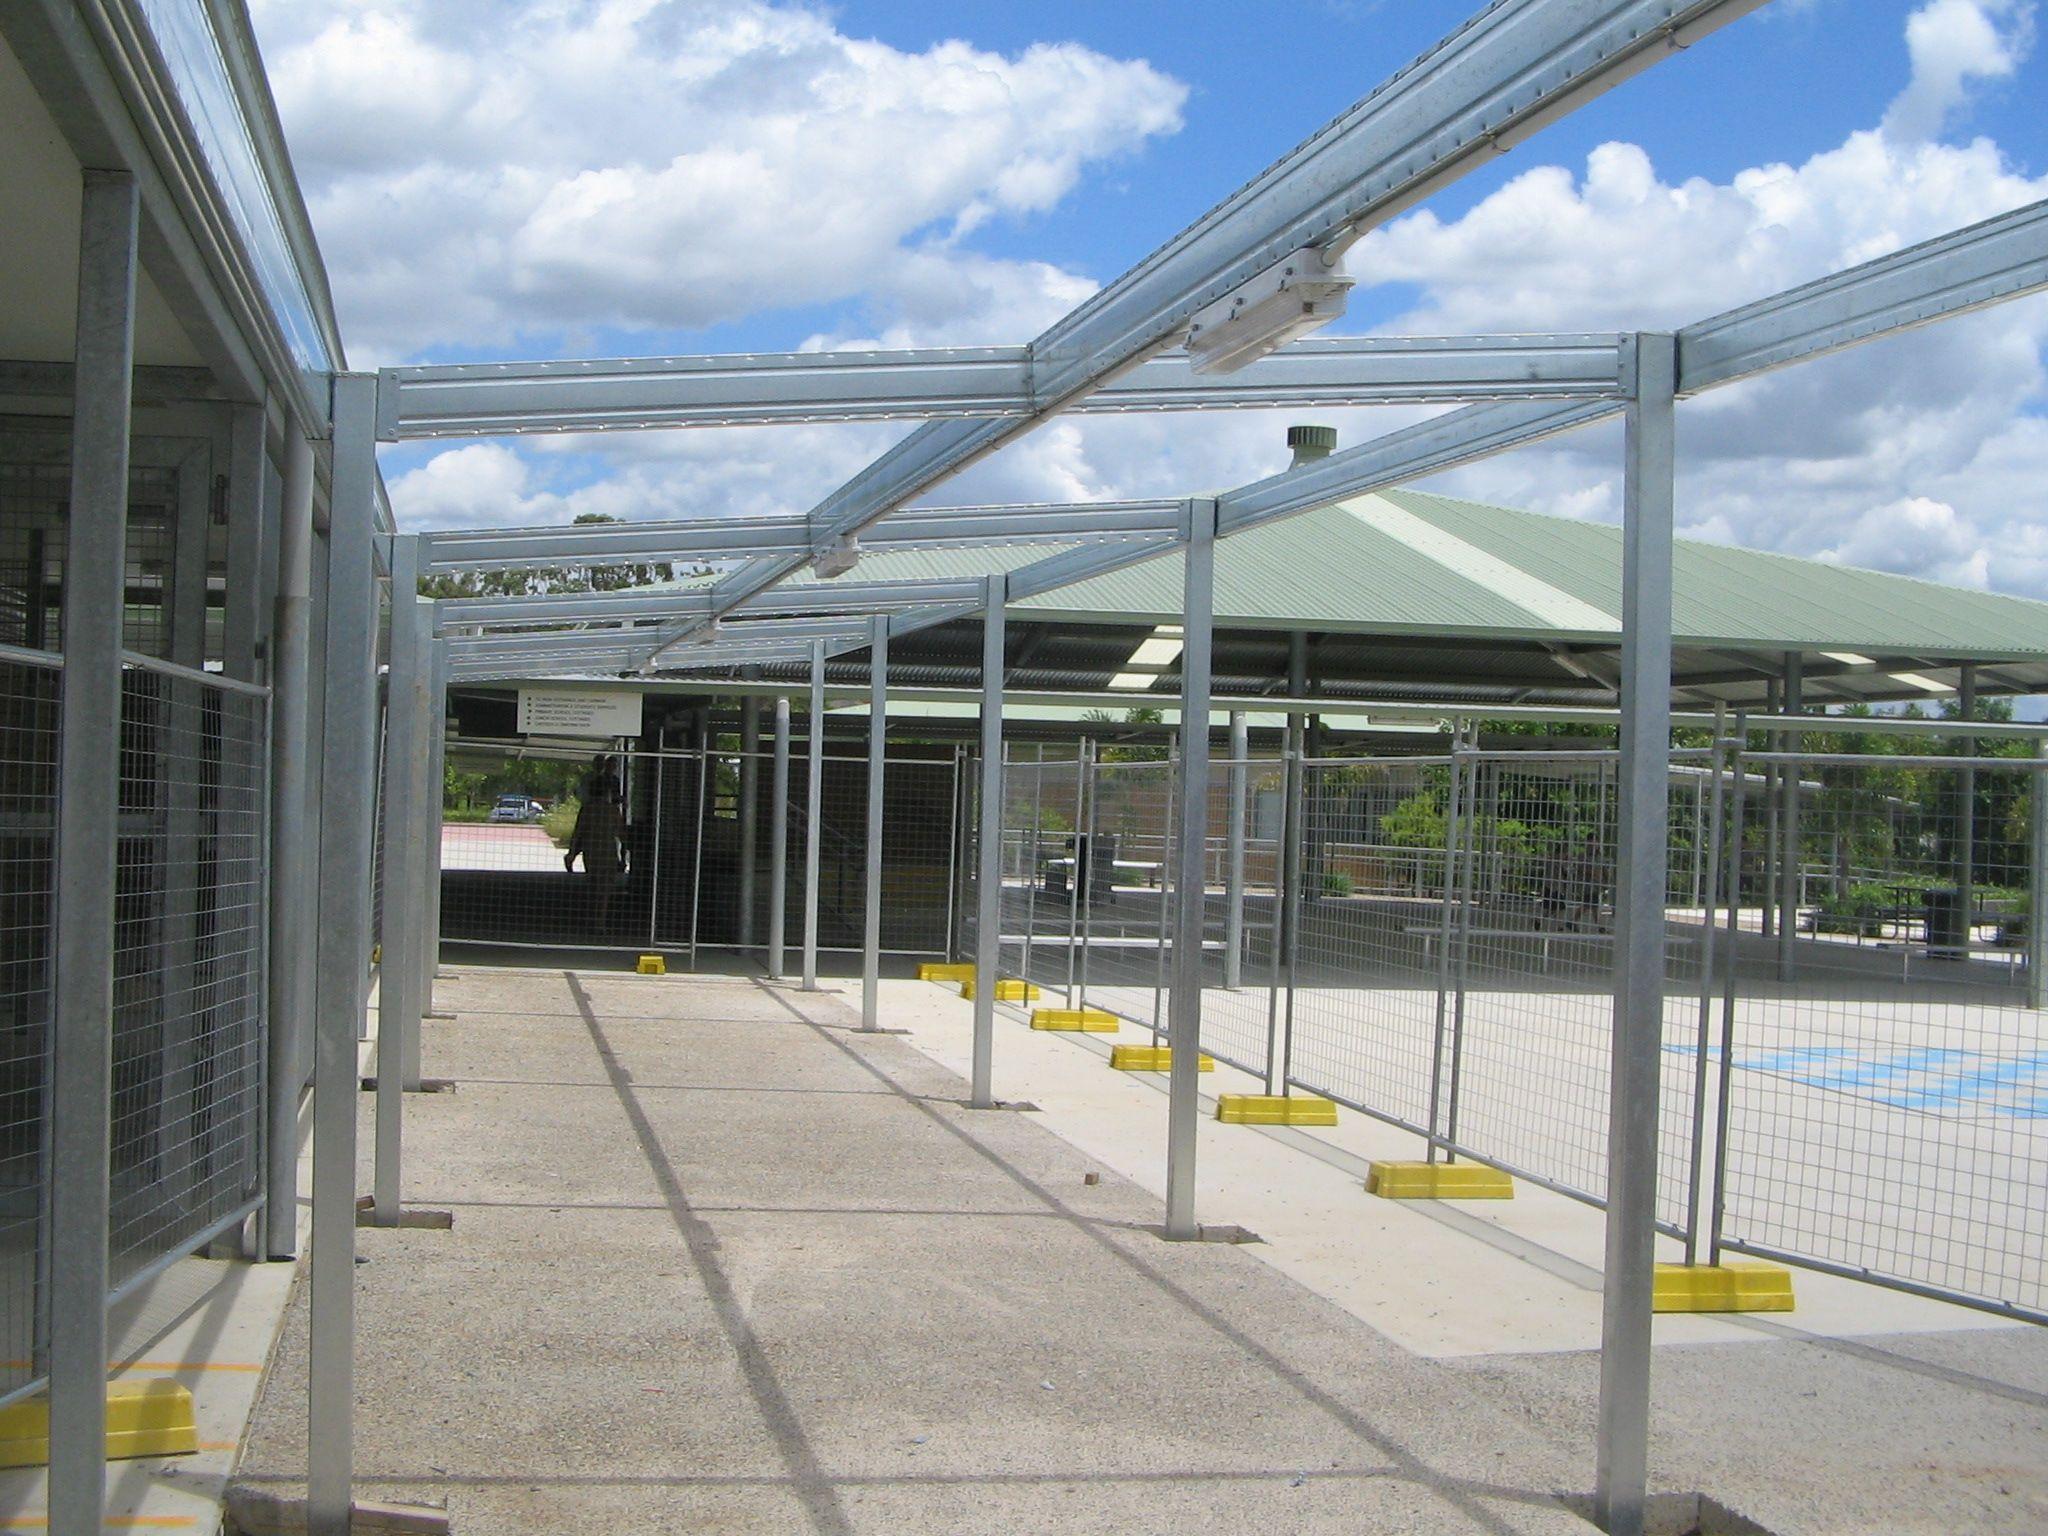 Spantec Steel Framing System-Boxspan Beams used on this walkway ...